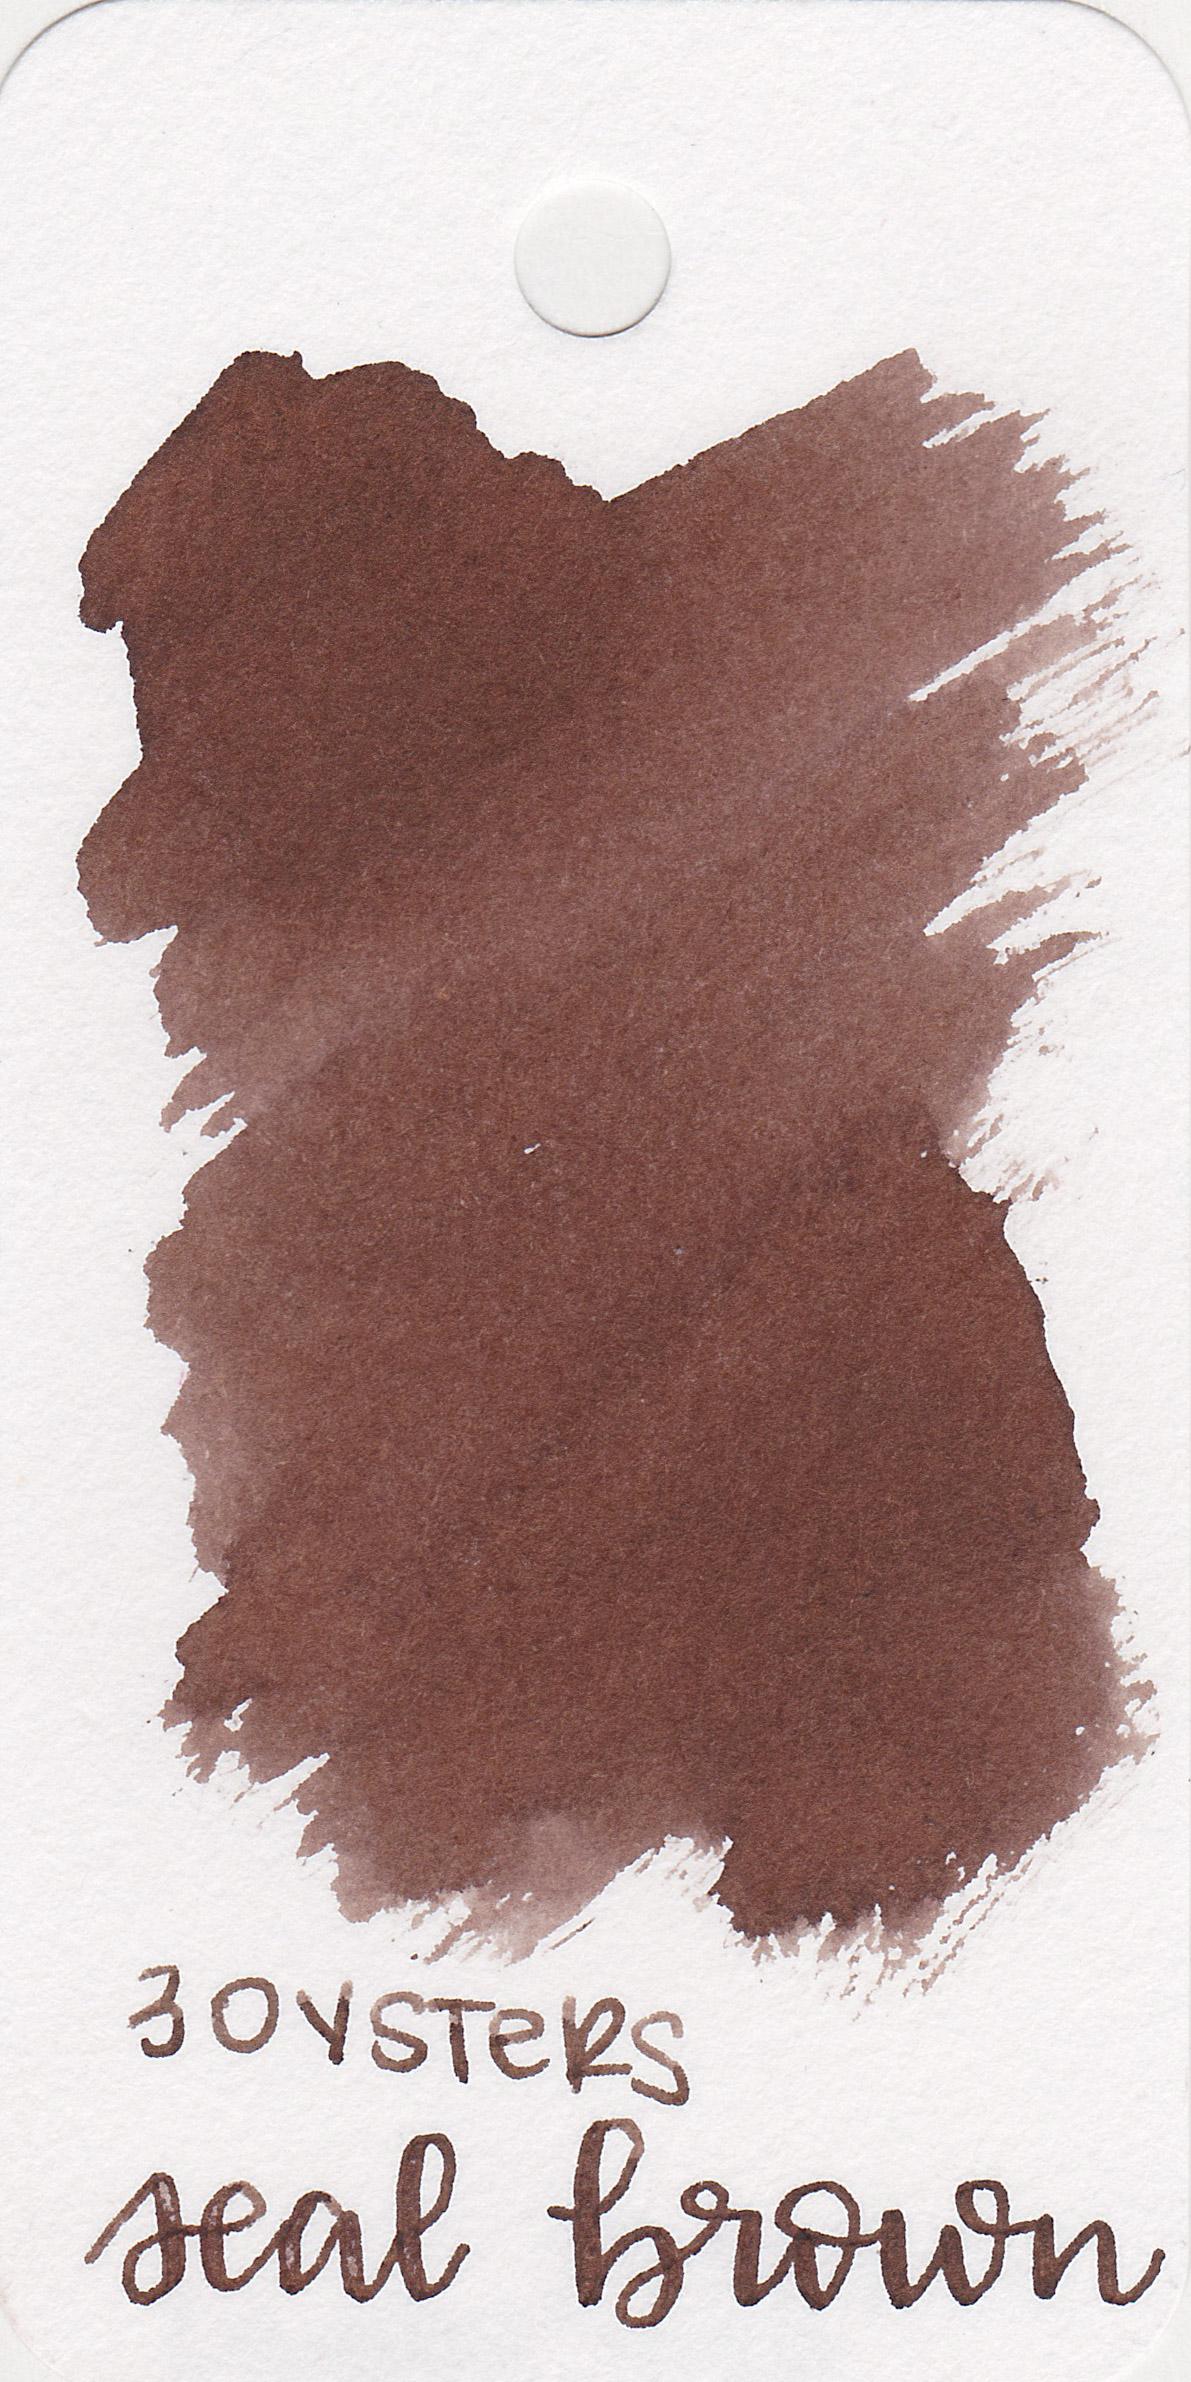 3o-seal-brown-1.jpg